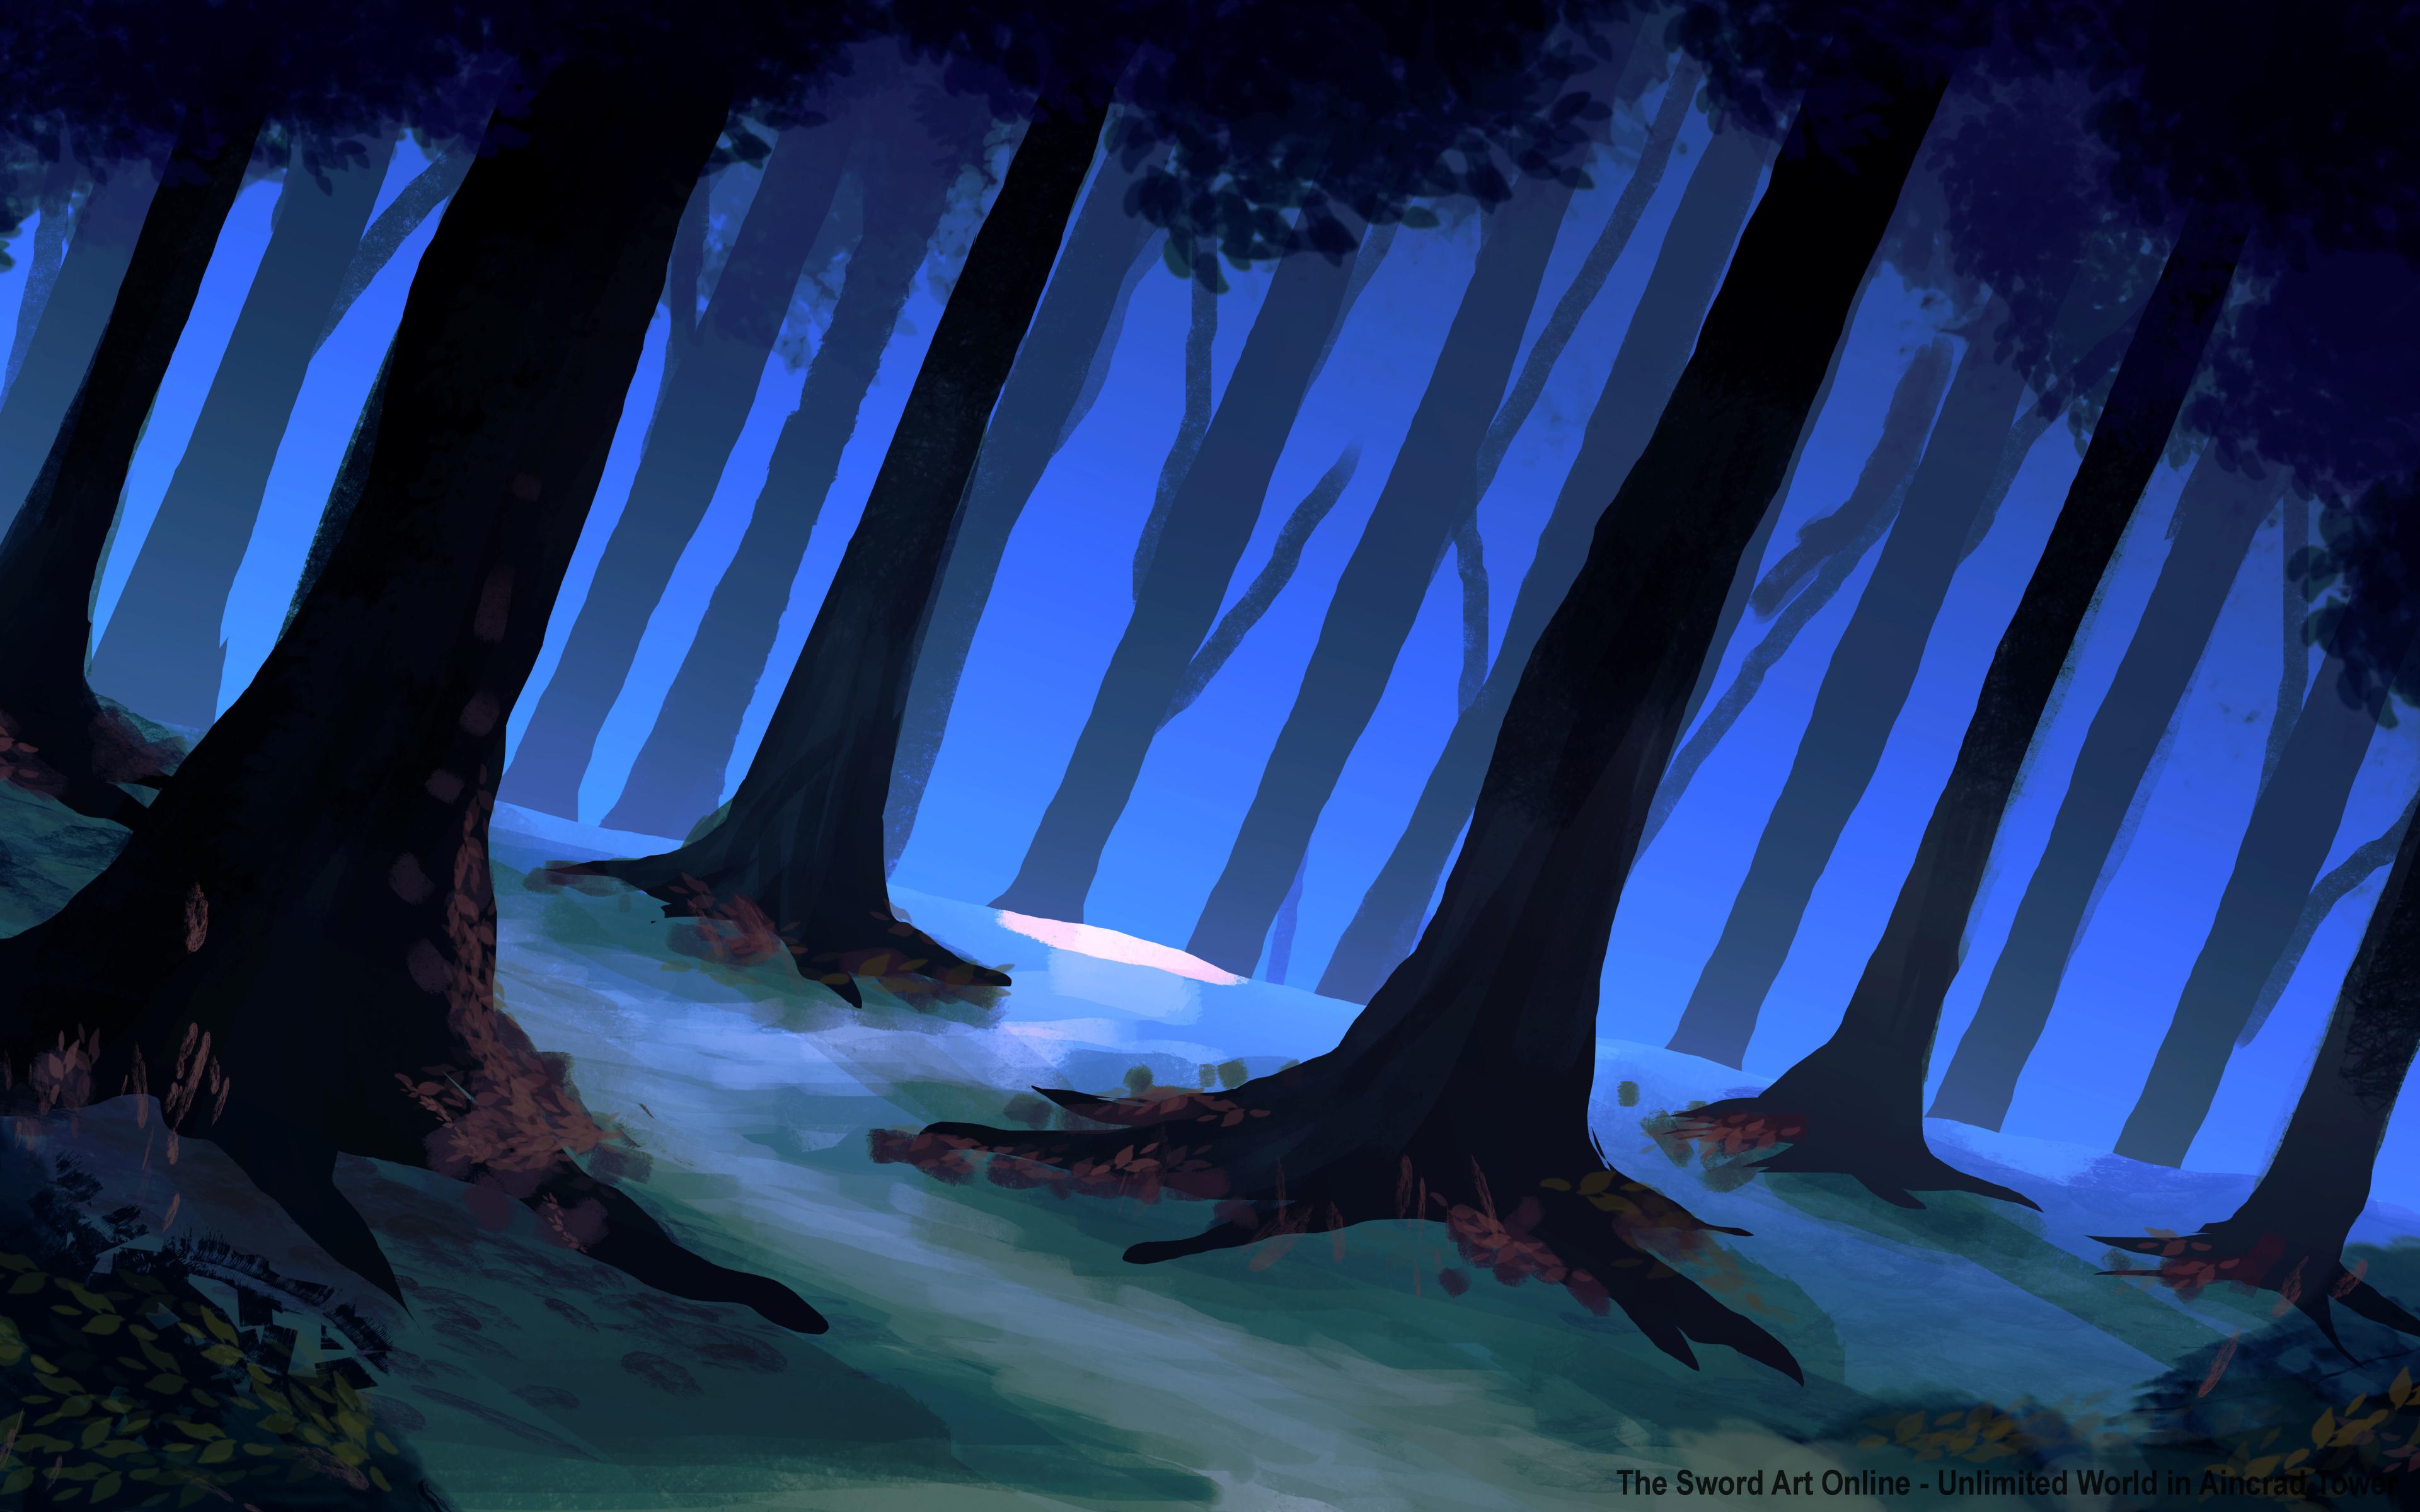 General 3840x2400 digital art forest trees fantasy art illustration painting night Ming Ren blue